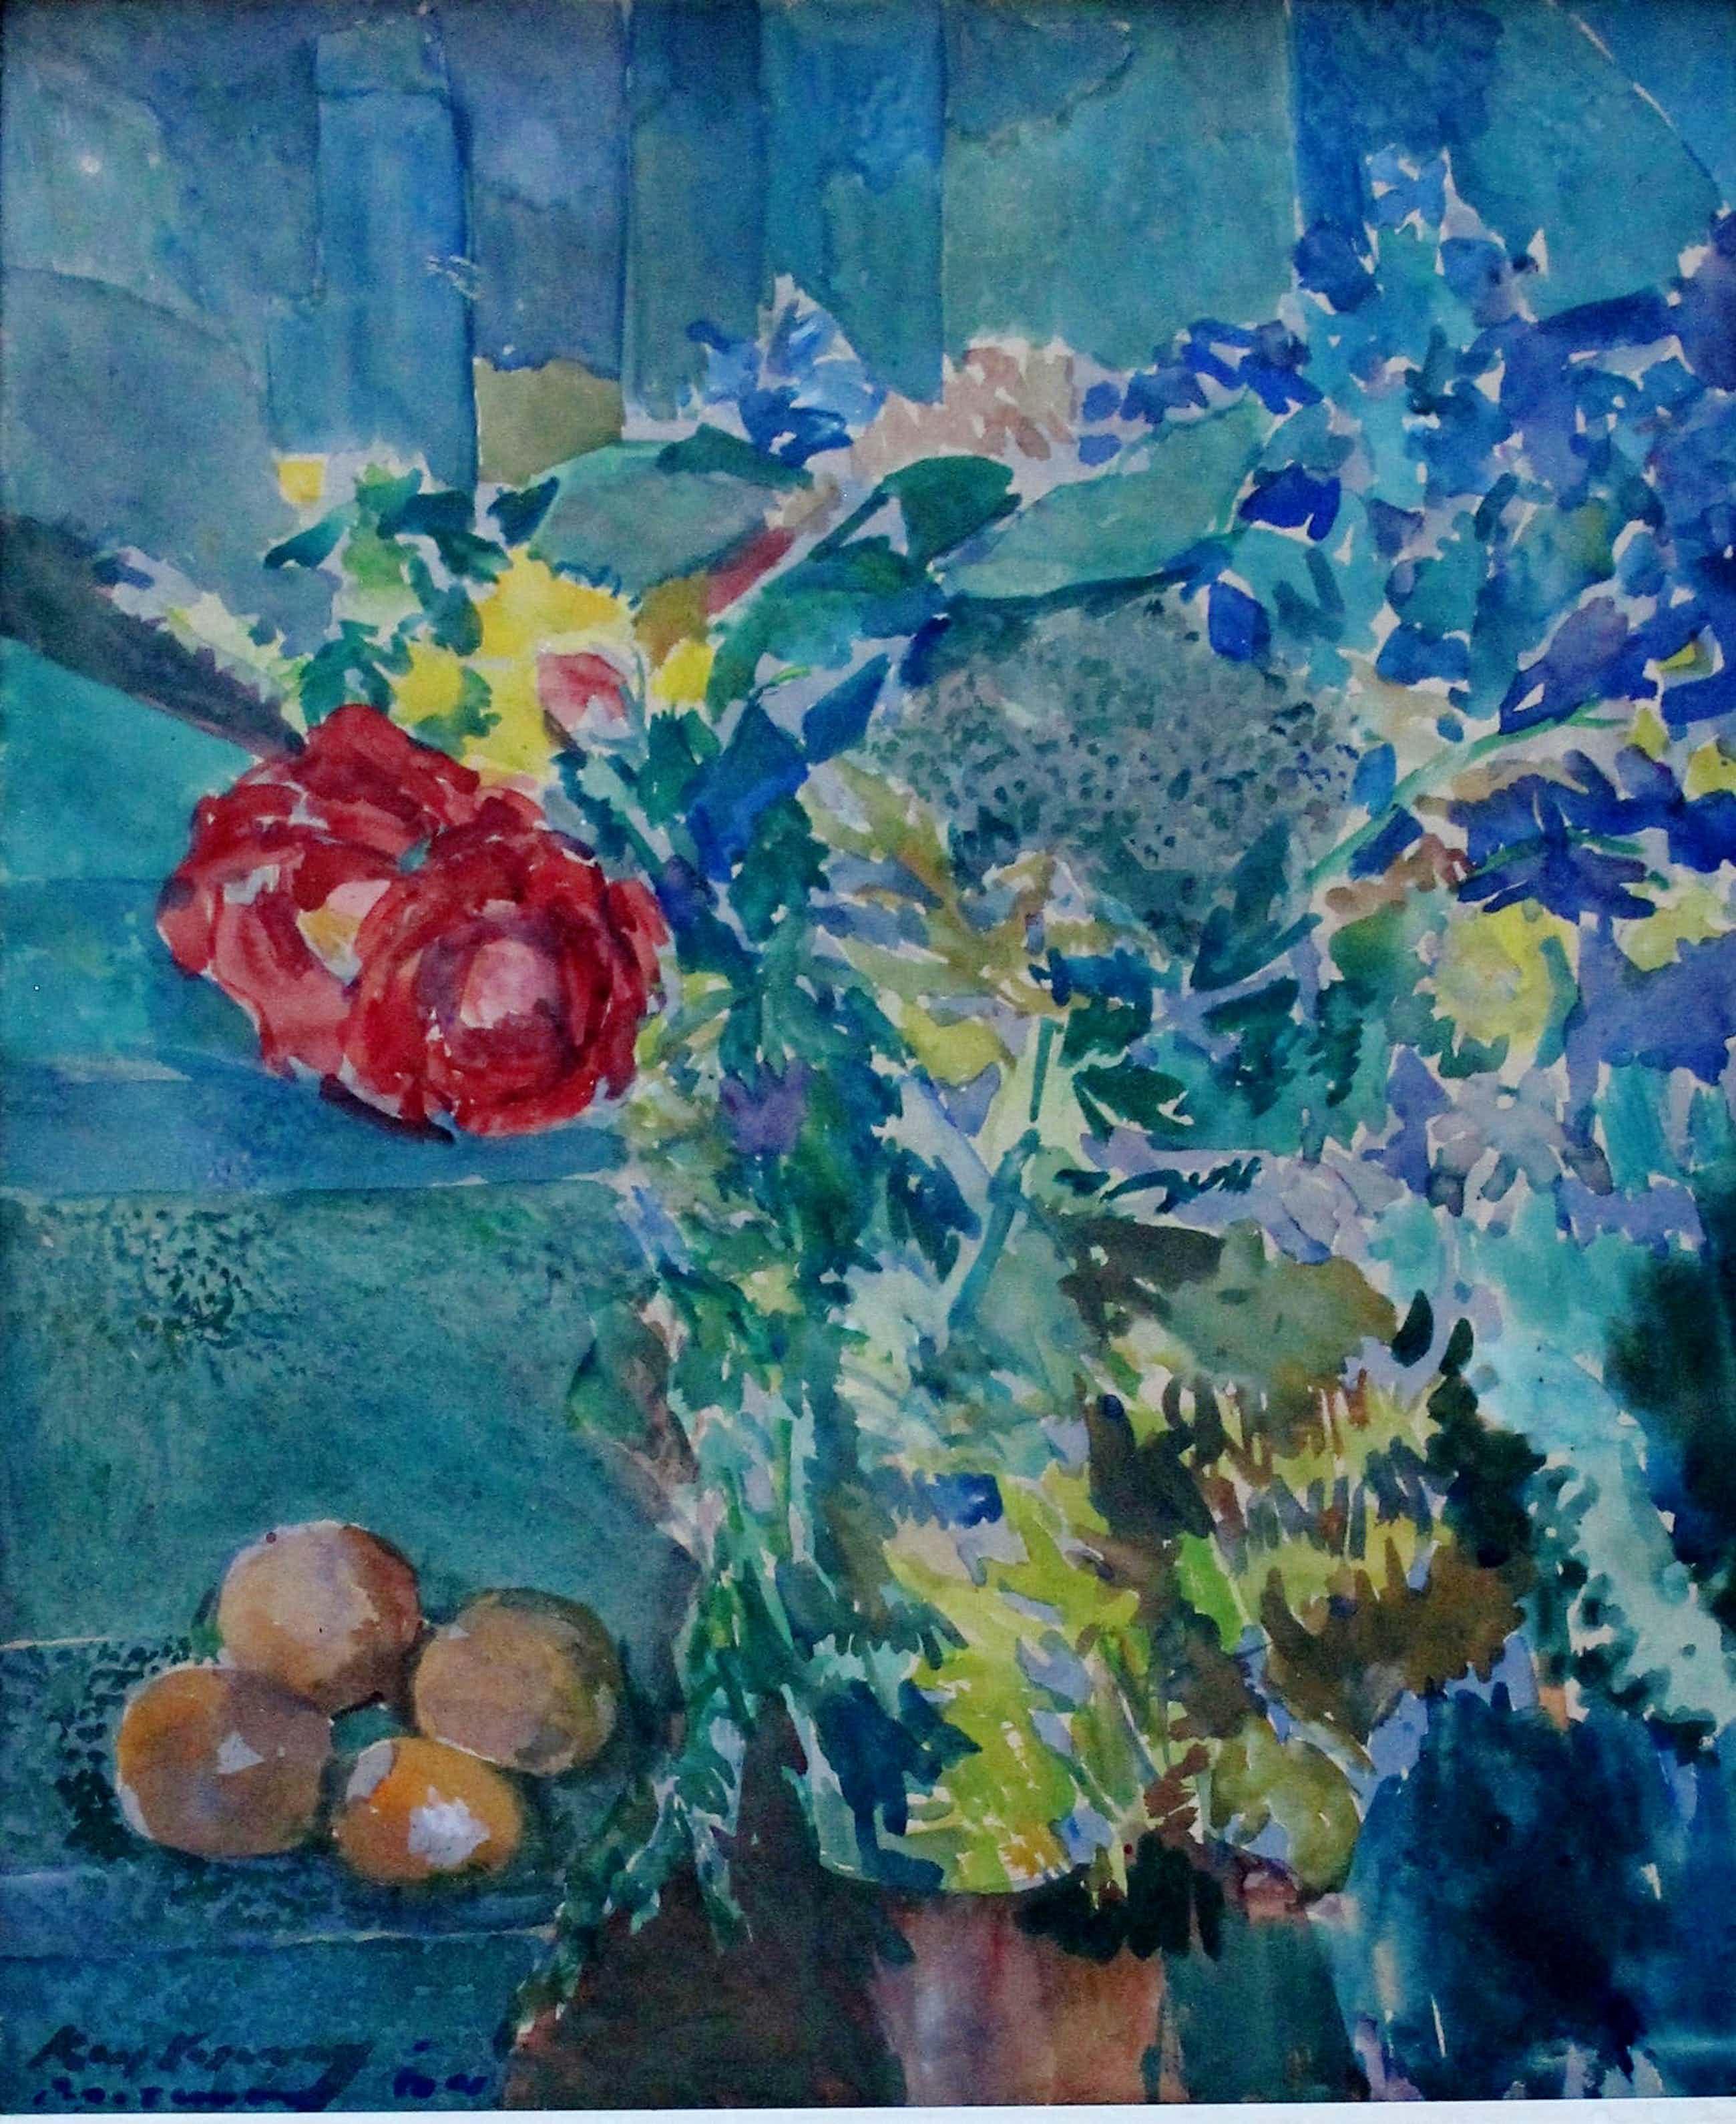 Kees Verwey - aquarel: bloemstilleven (herkomst: kunsthandel M.L. de Boer, Amsterdam) kopen? Bied vanaf 1550!